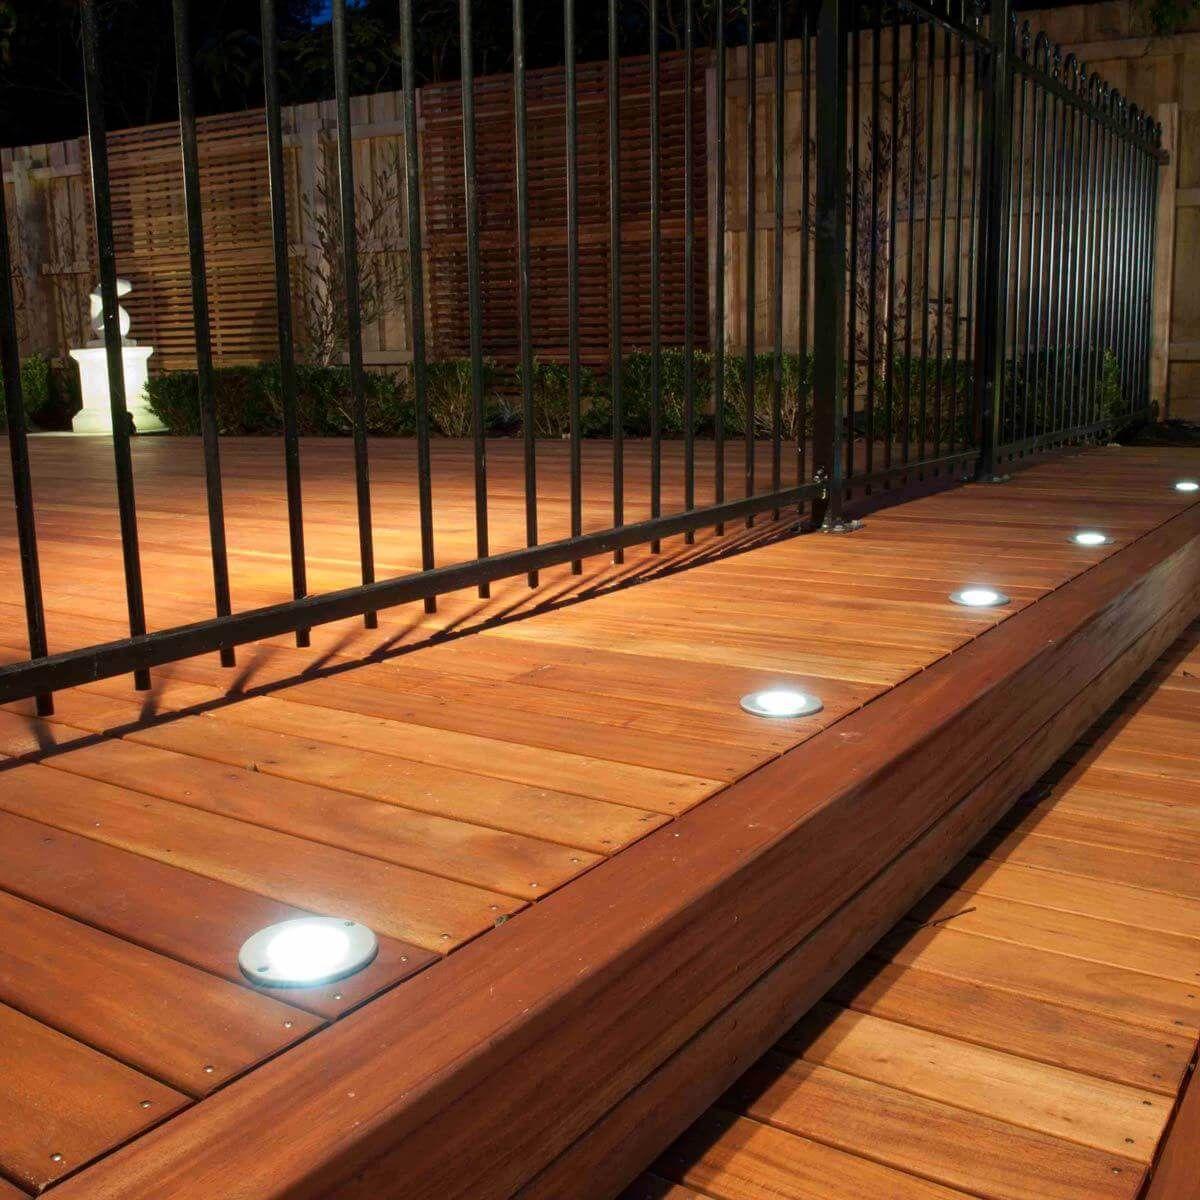 12 Ideas For Lighting Up Your Deck Deck Lighting Led Deck